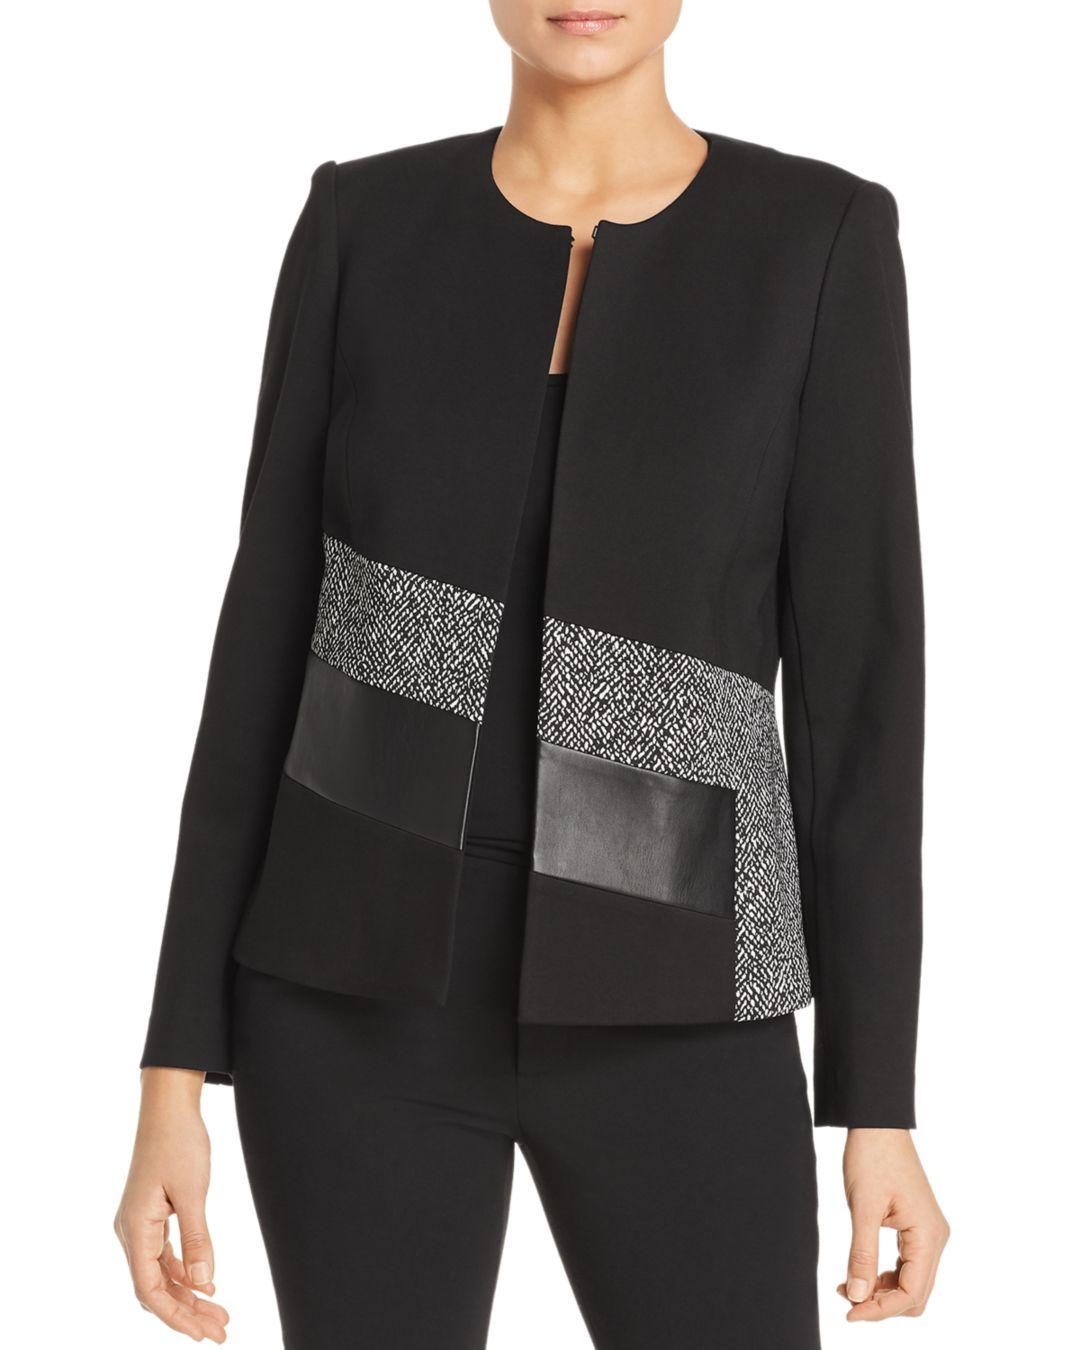 4e5ec94770b96 Lyst - Calvin Klein Mixed Media Jacket in Black